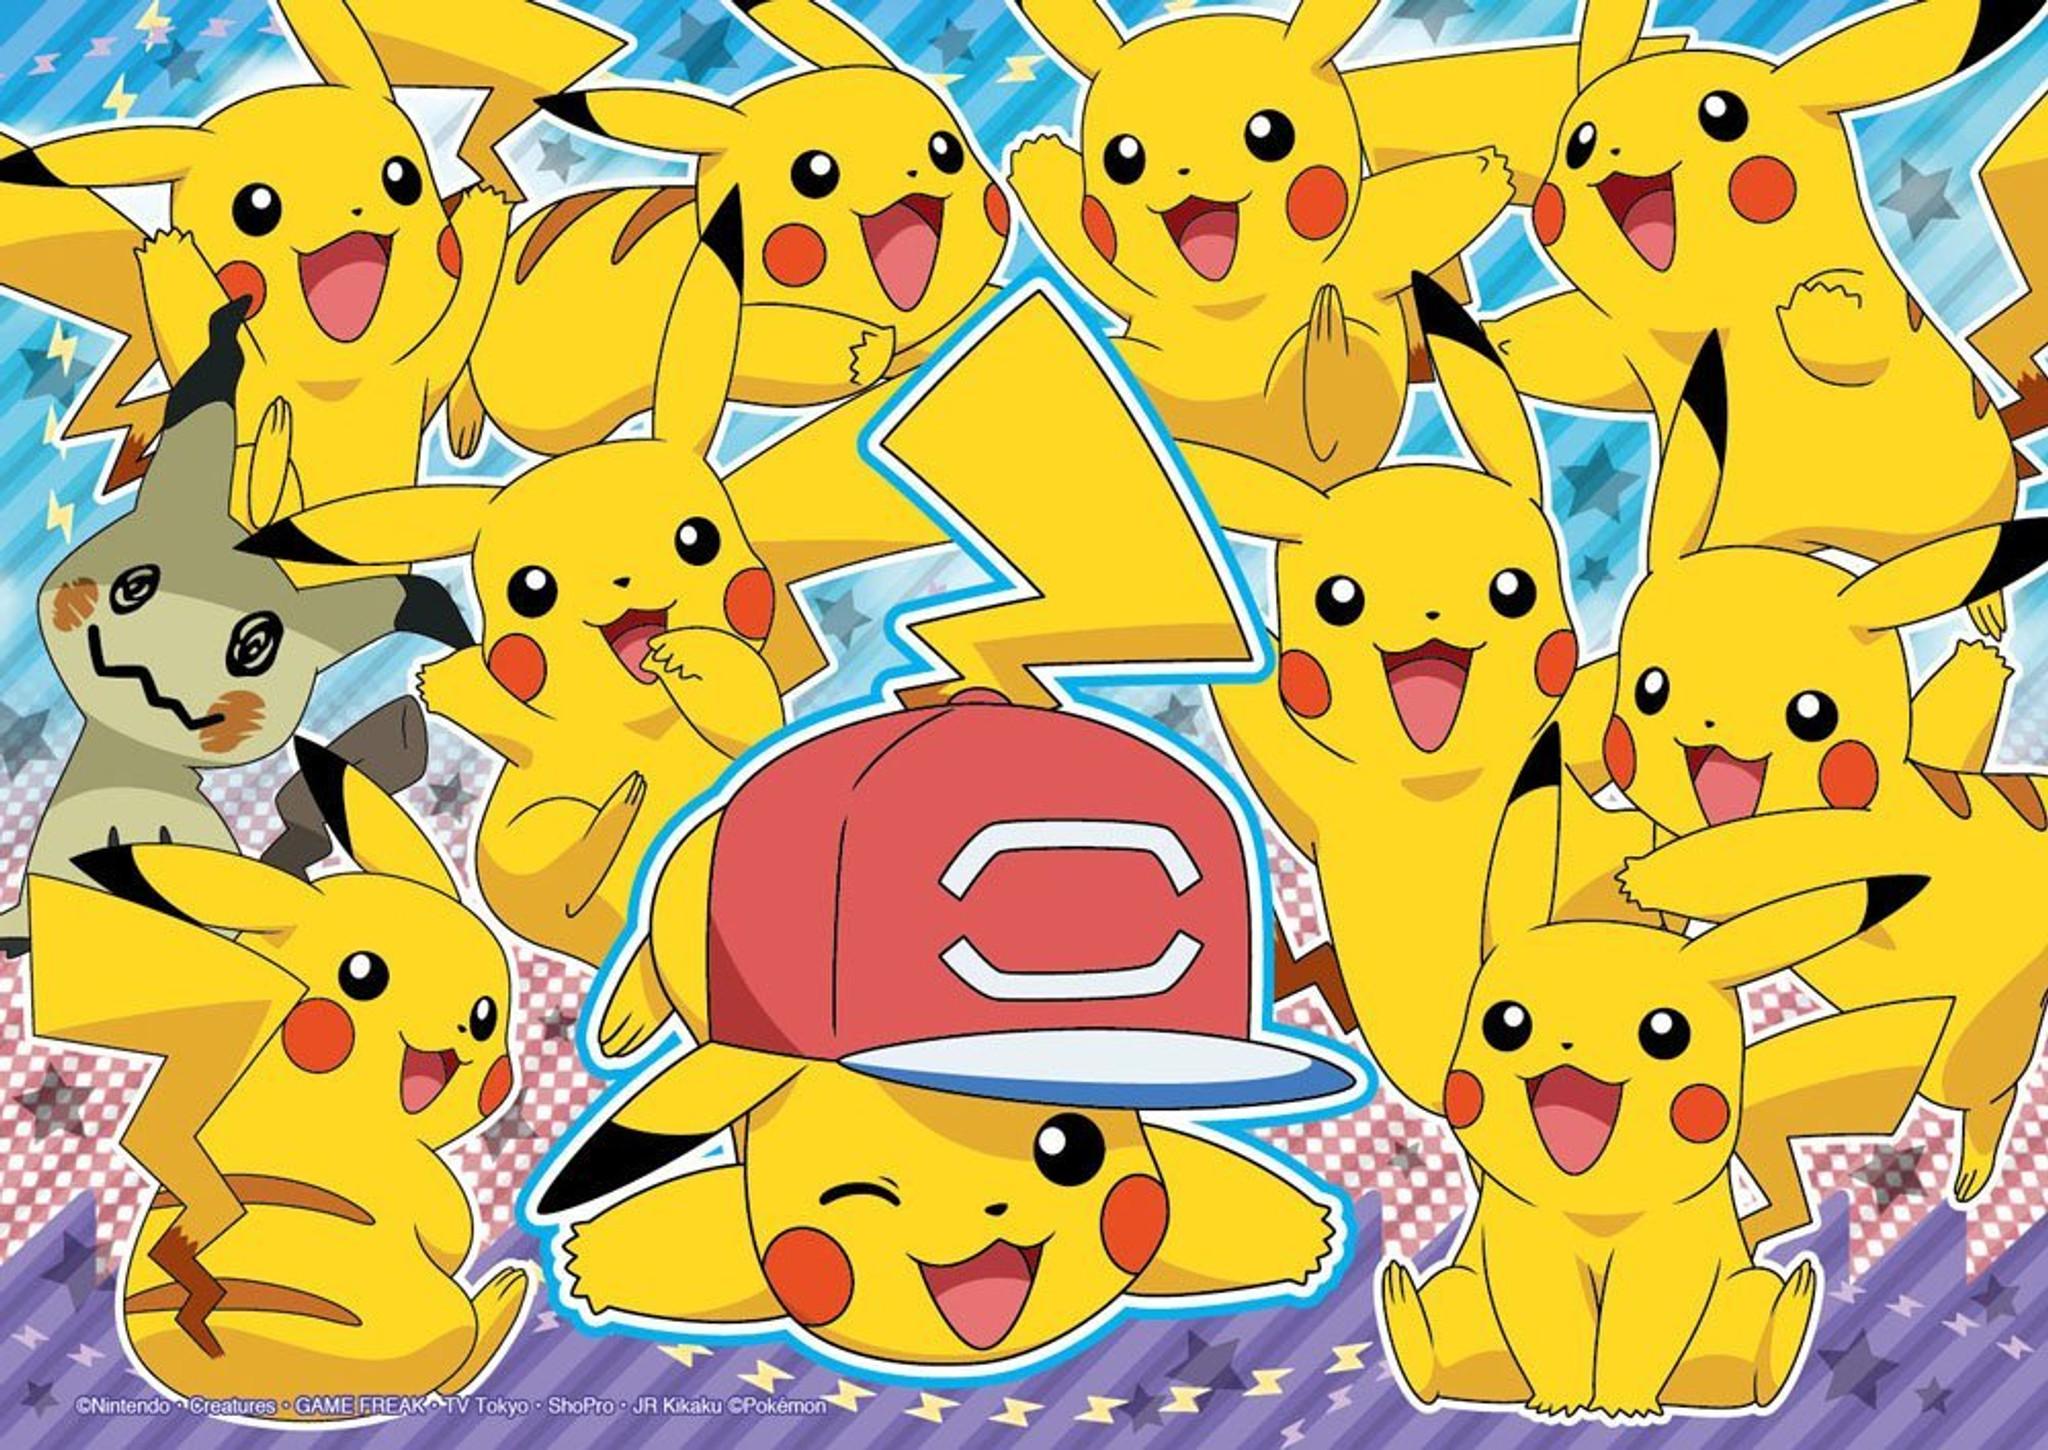 A Pikachu and Mimikyu puzzle